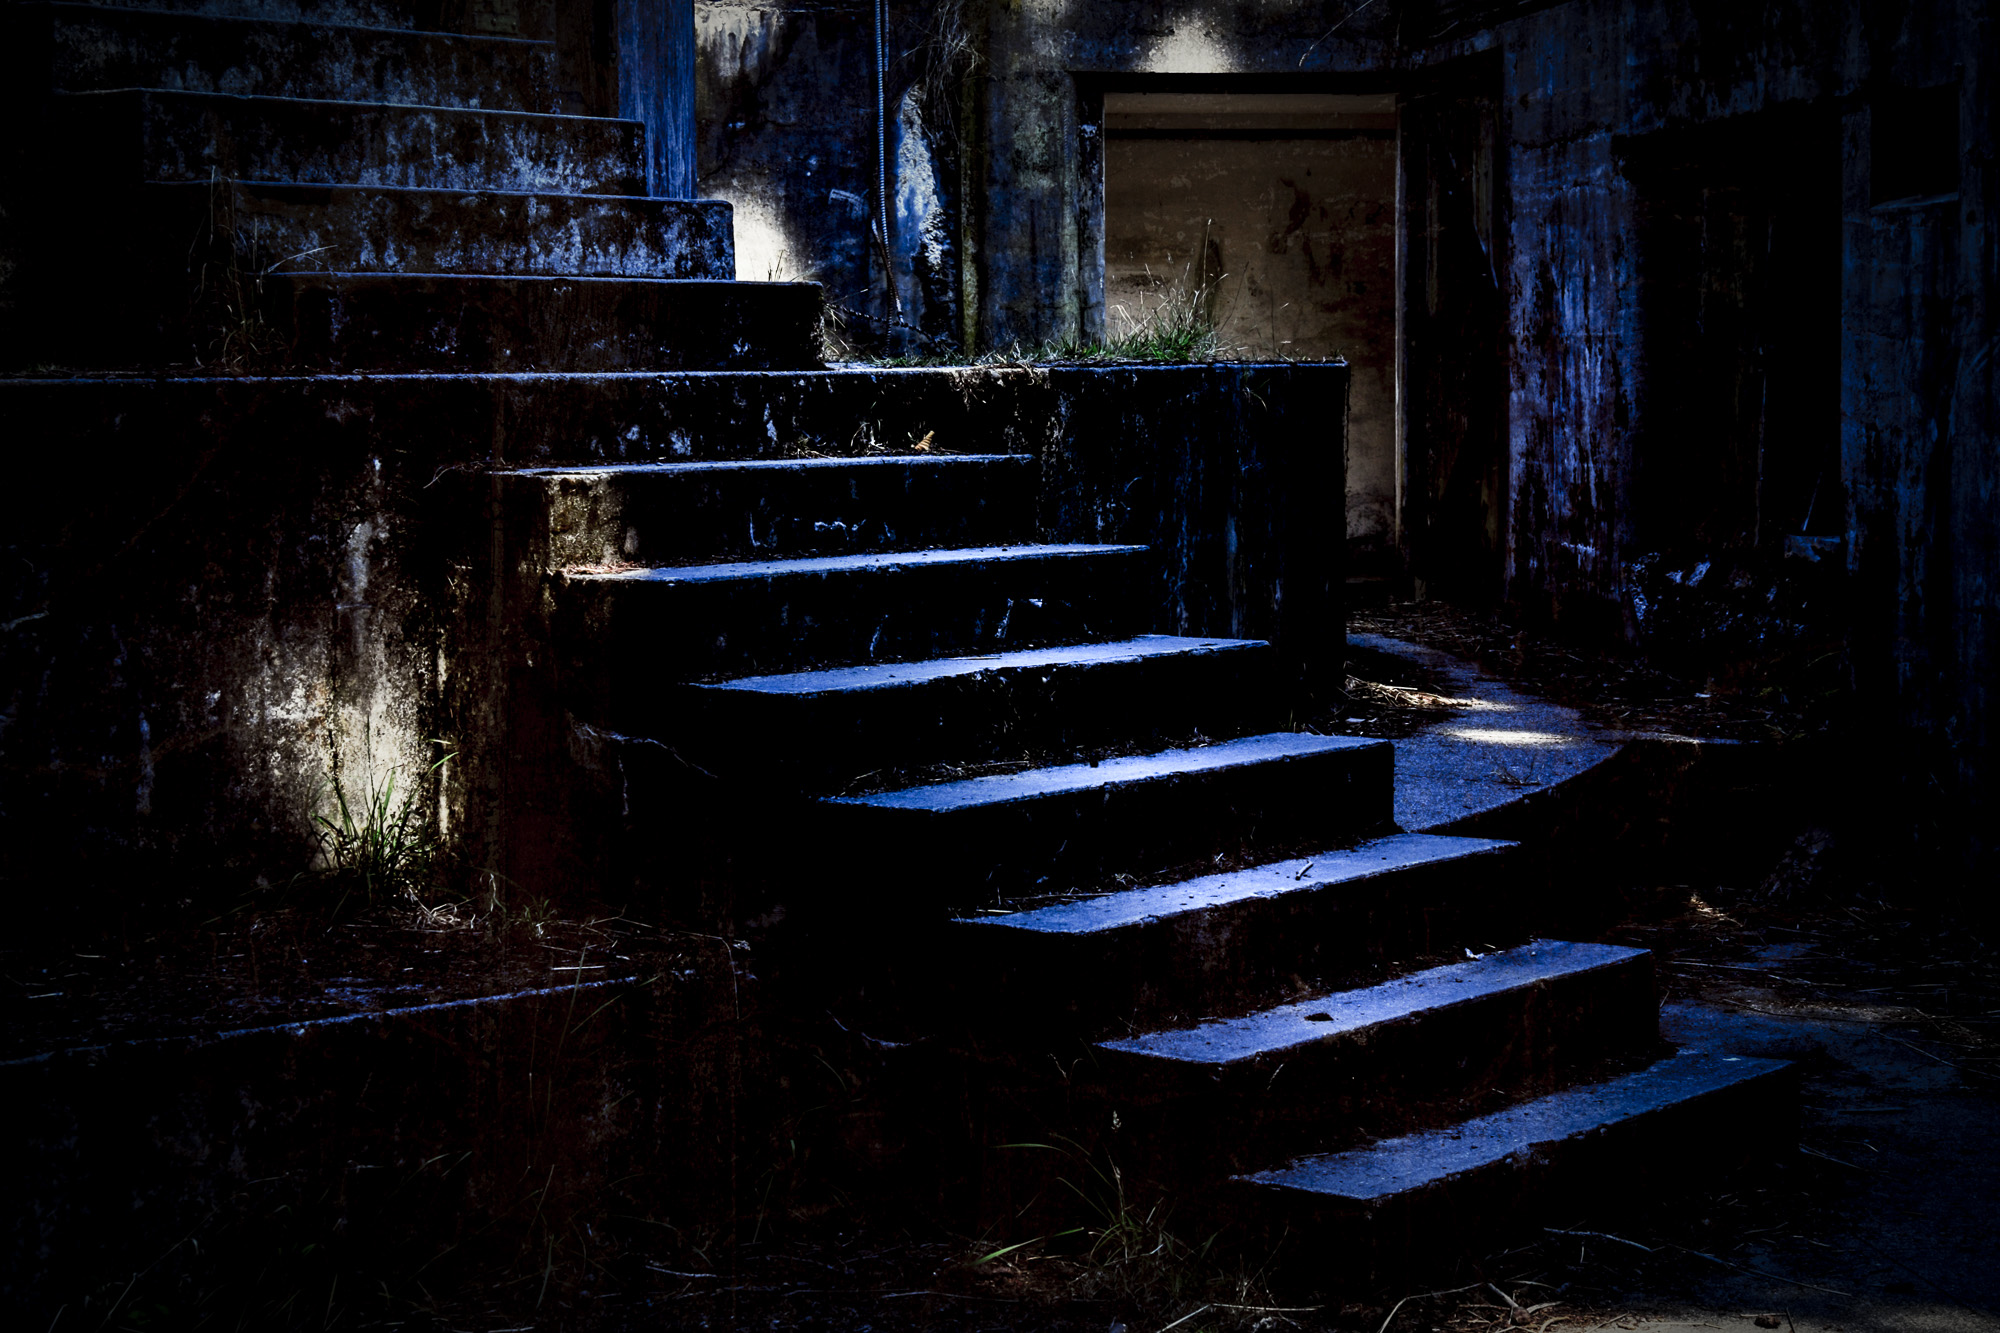 Hemingway_B_TheatreOfFear-Cerulean_Sunlight.jpg